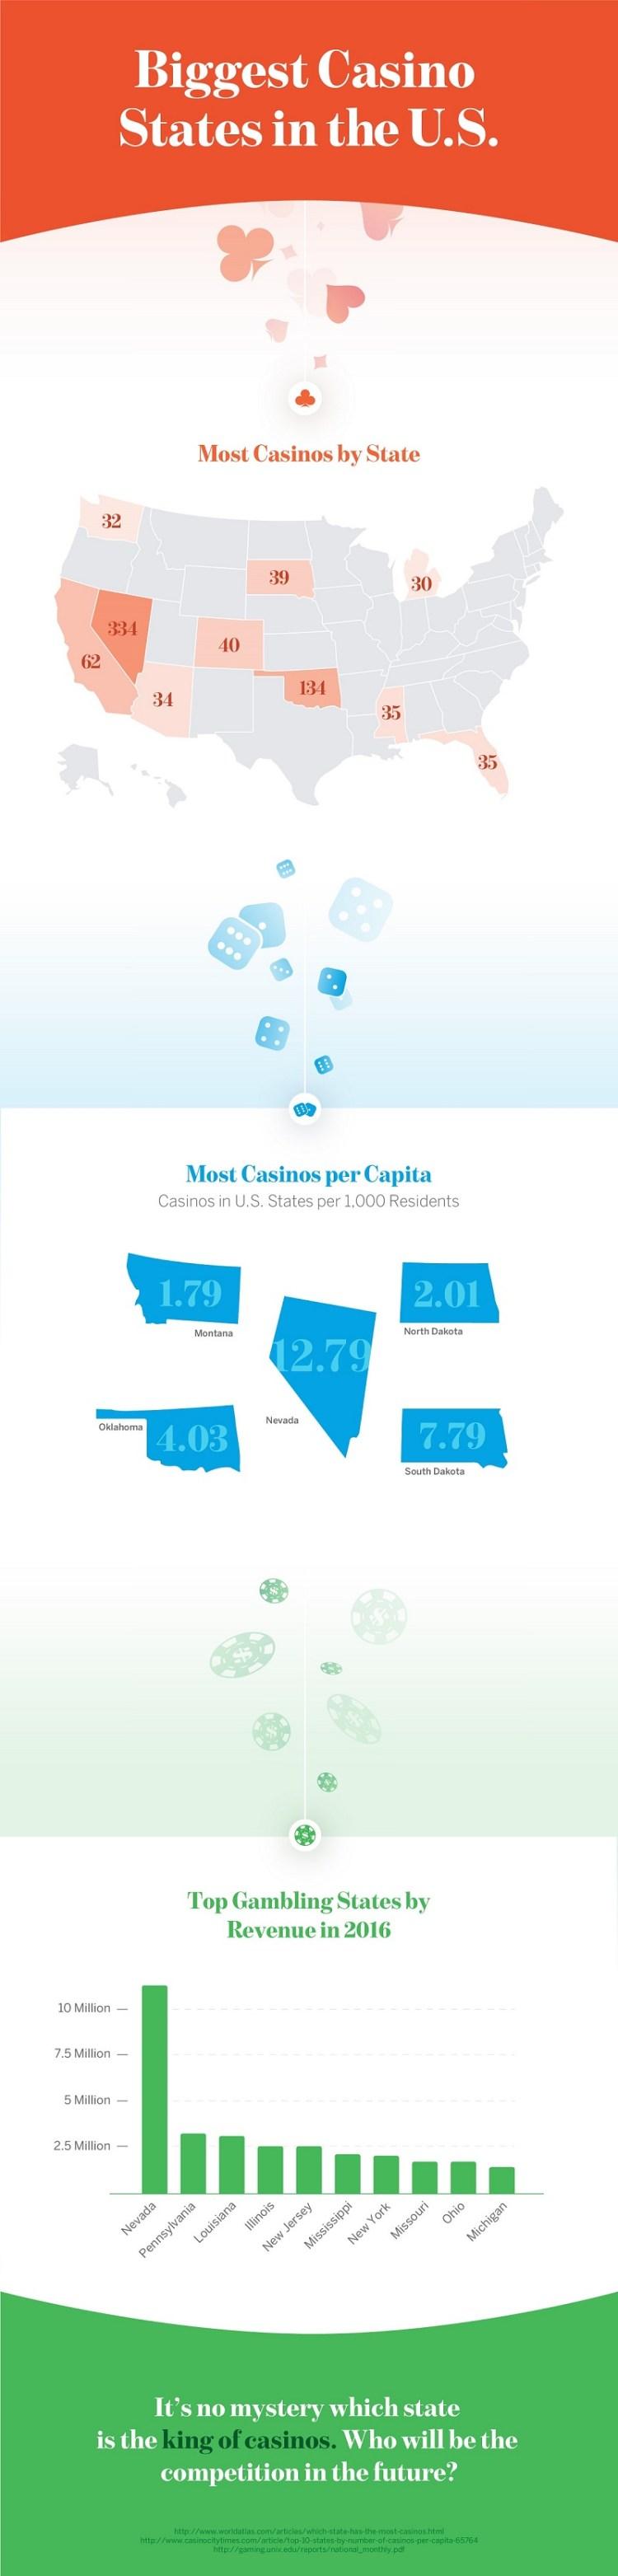 Biggest Casino States in the U.S.